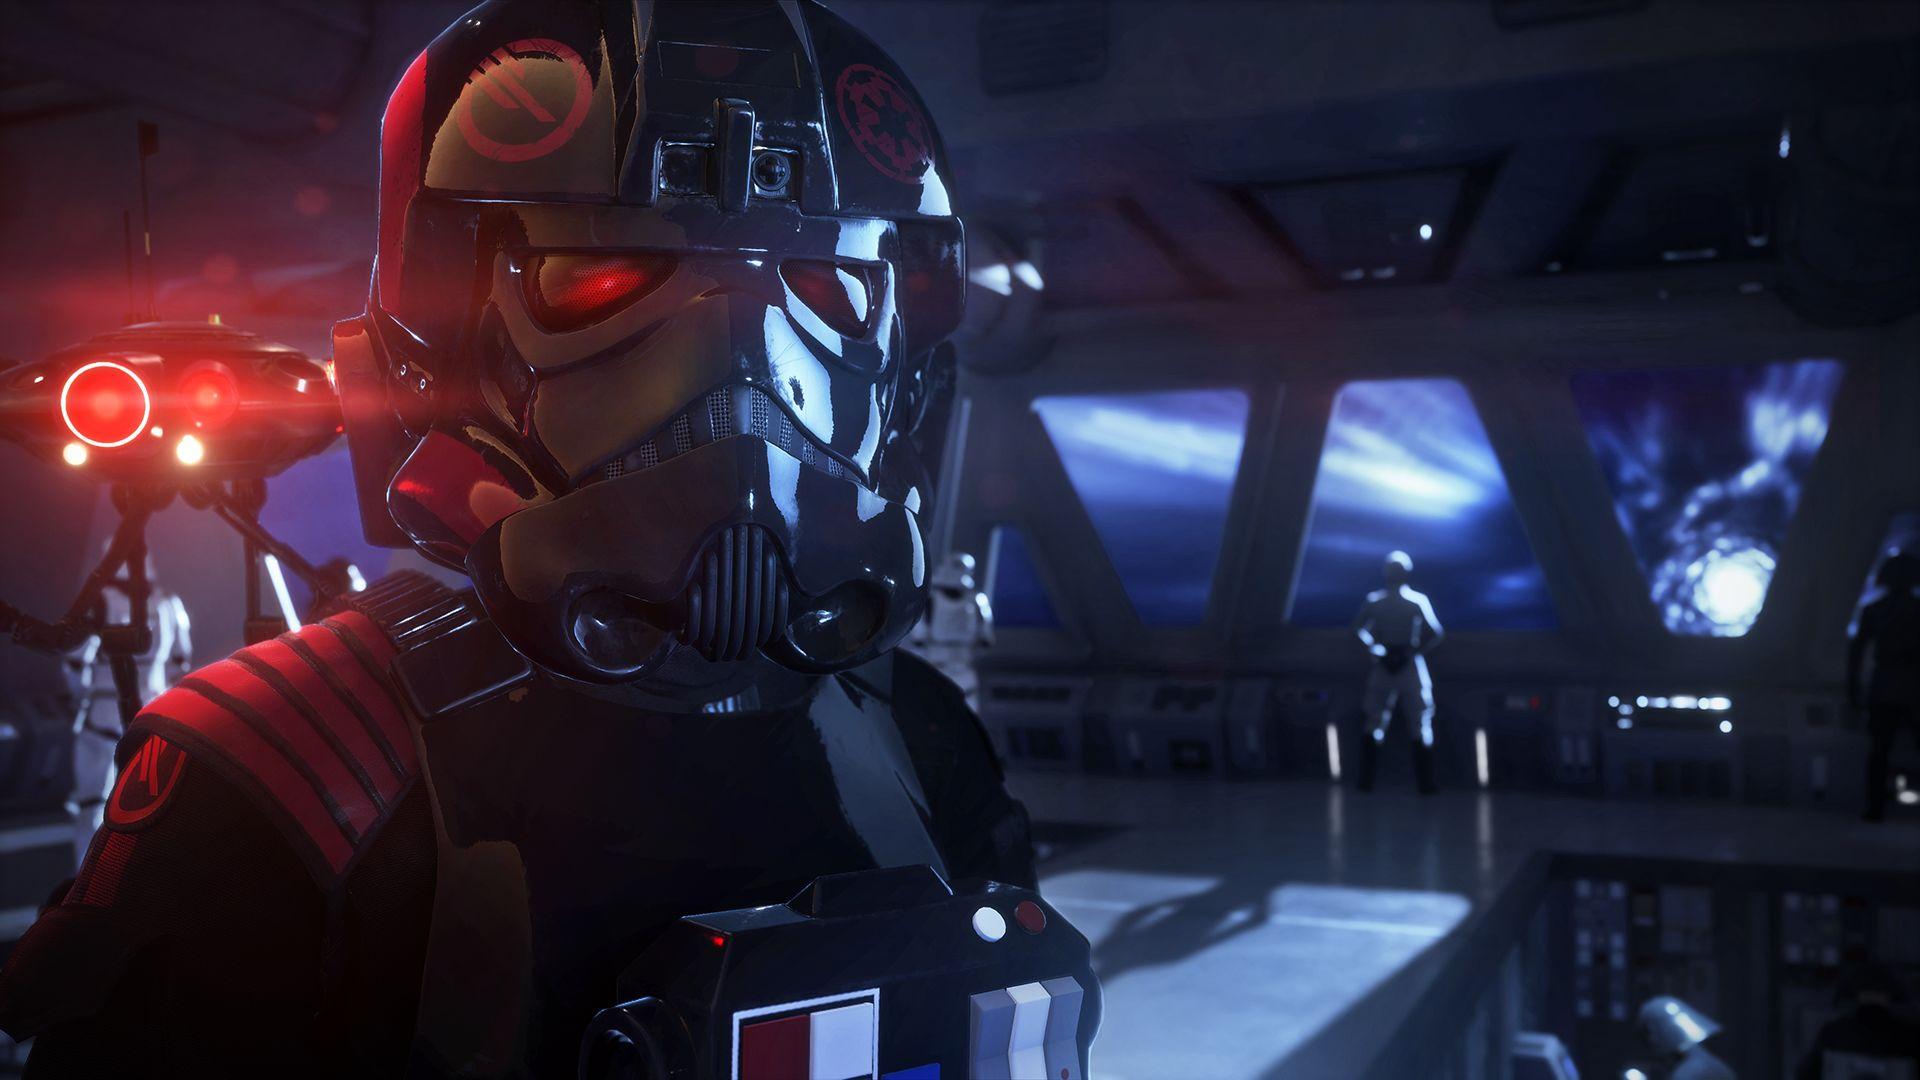 Star Wars: Battlefront II - don't underestimate its power